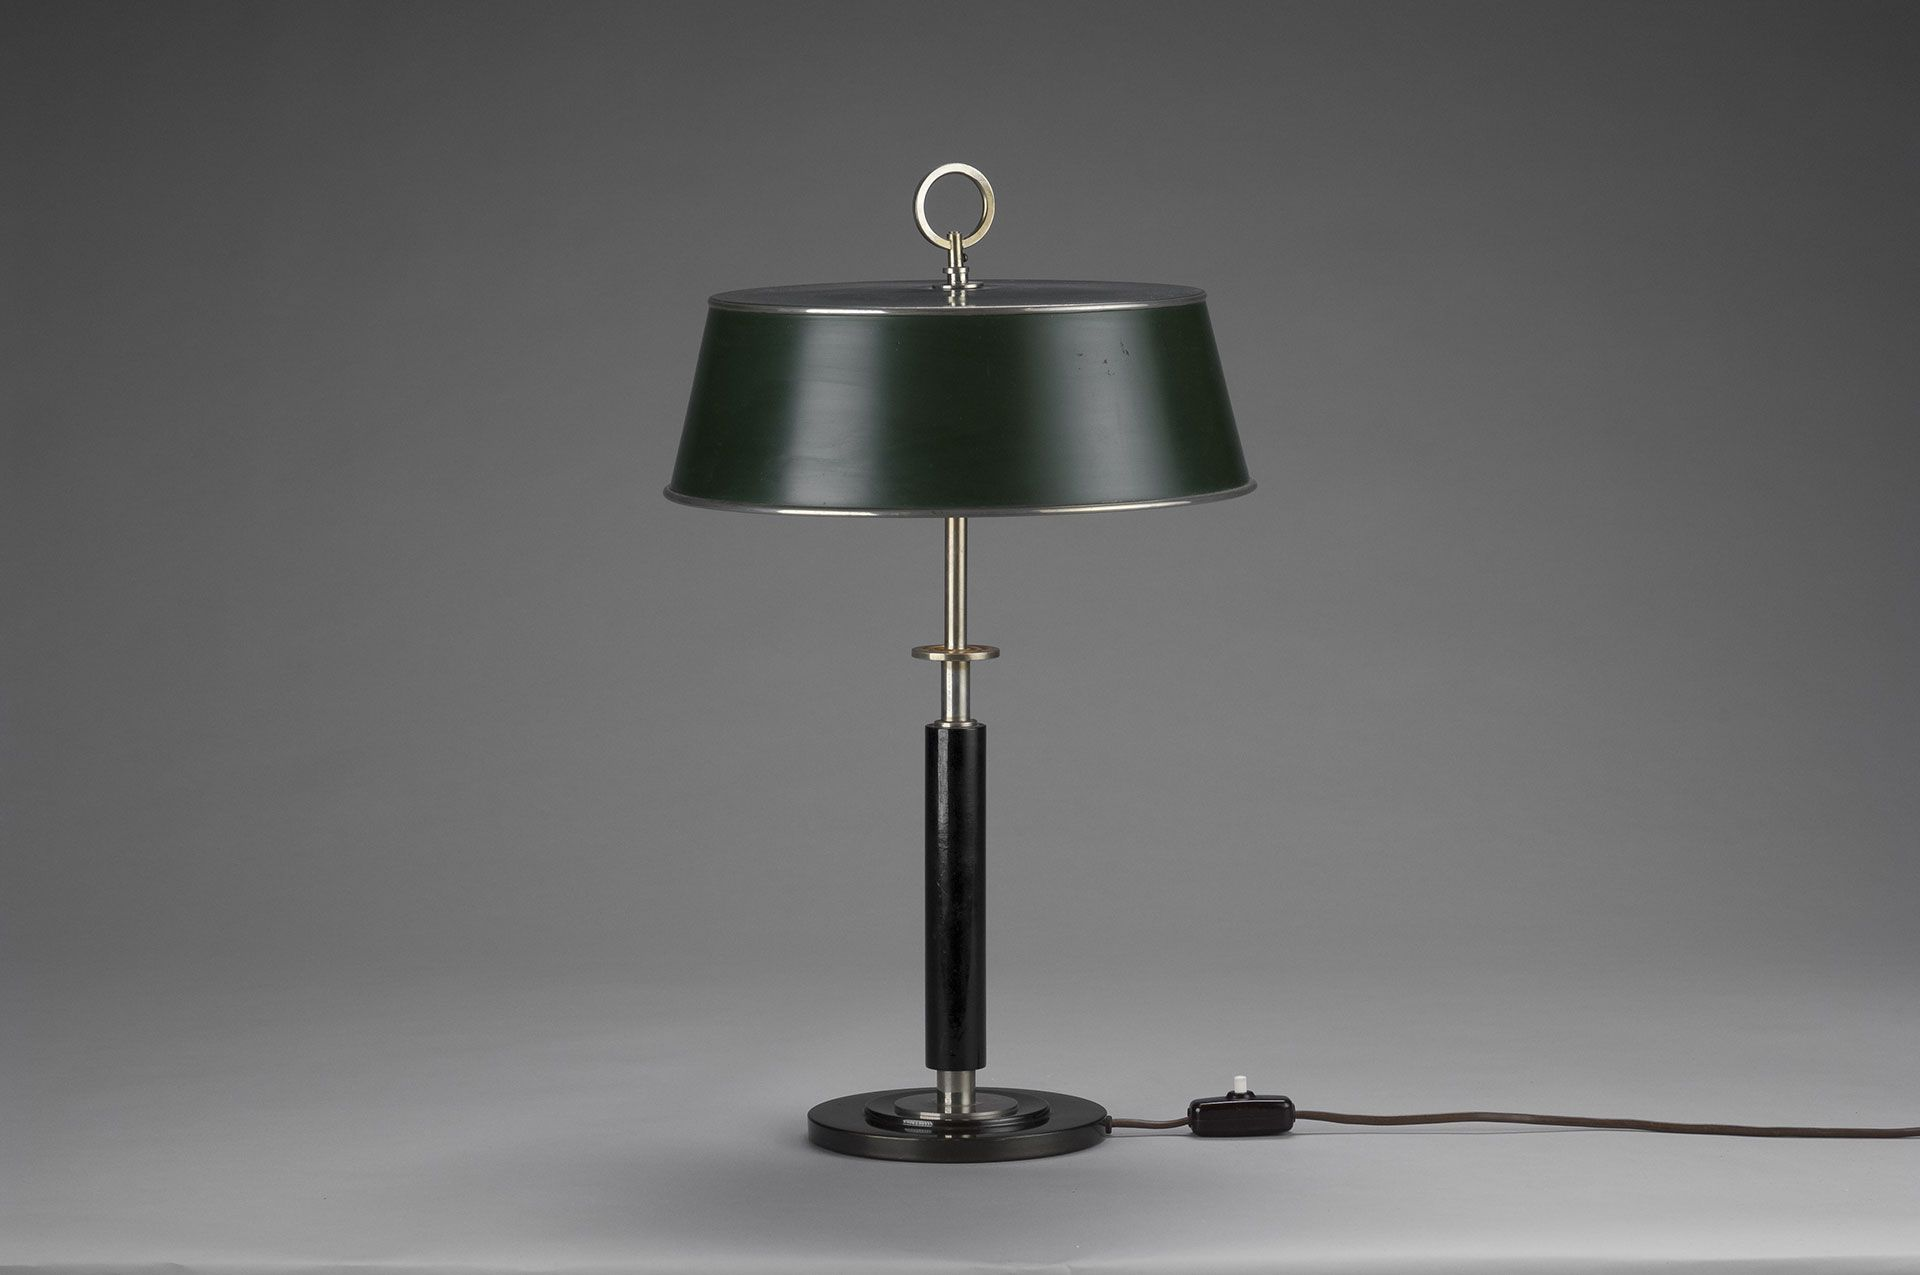 Jacksons Table Lamp Tidstrand Erik Lamp Table Lamp Brass Table Lamps